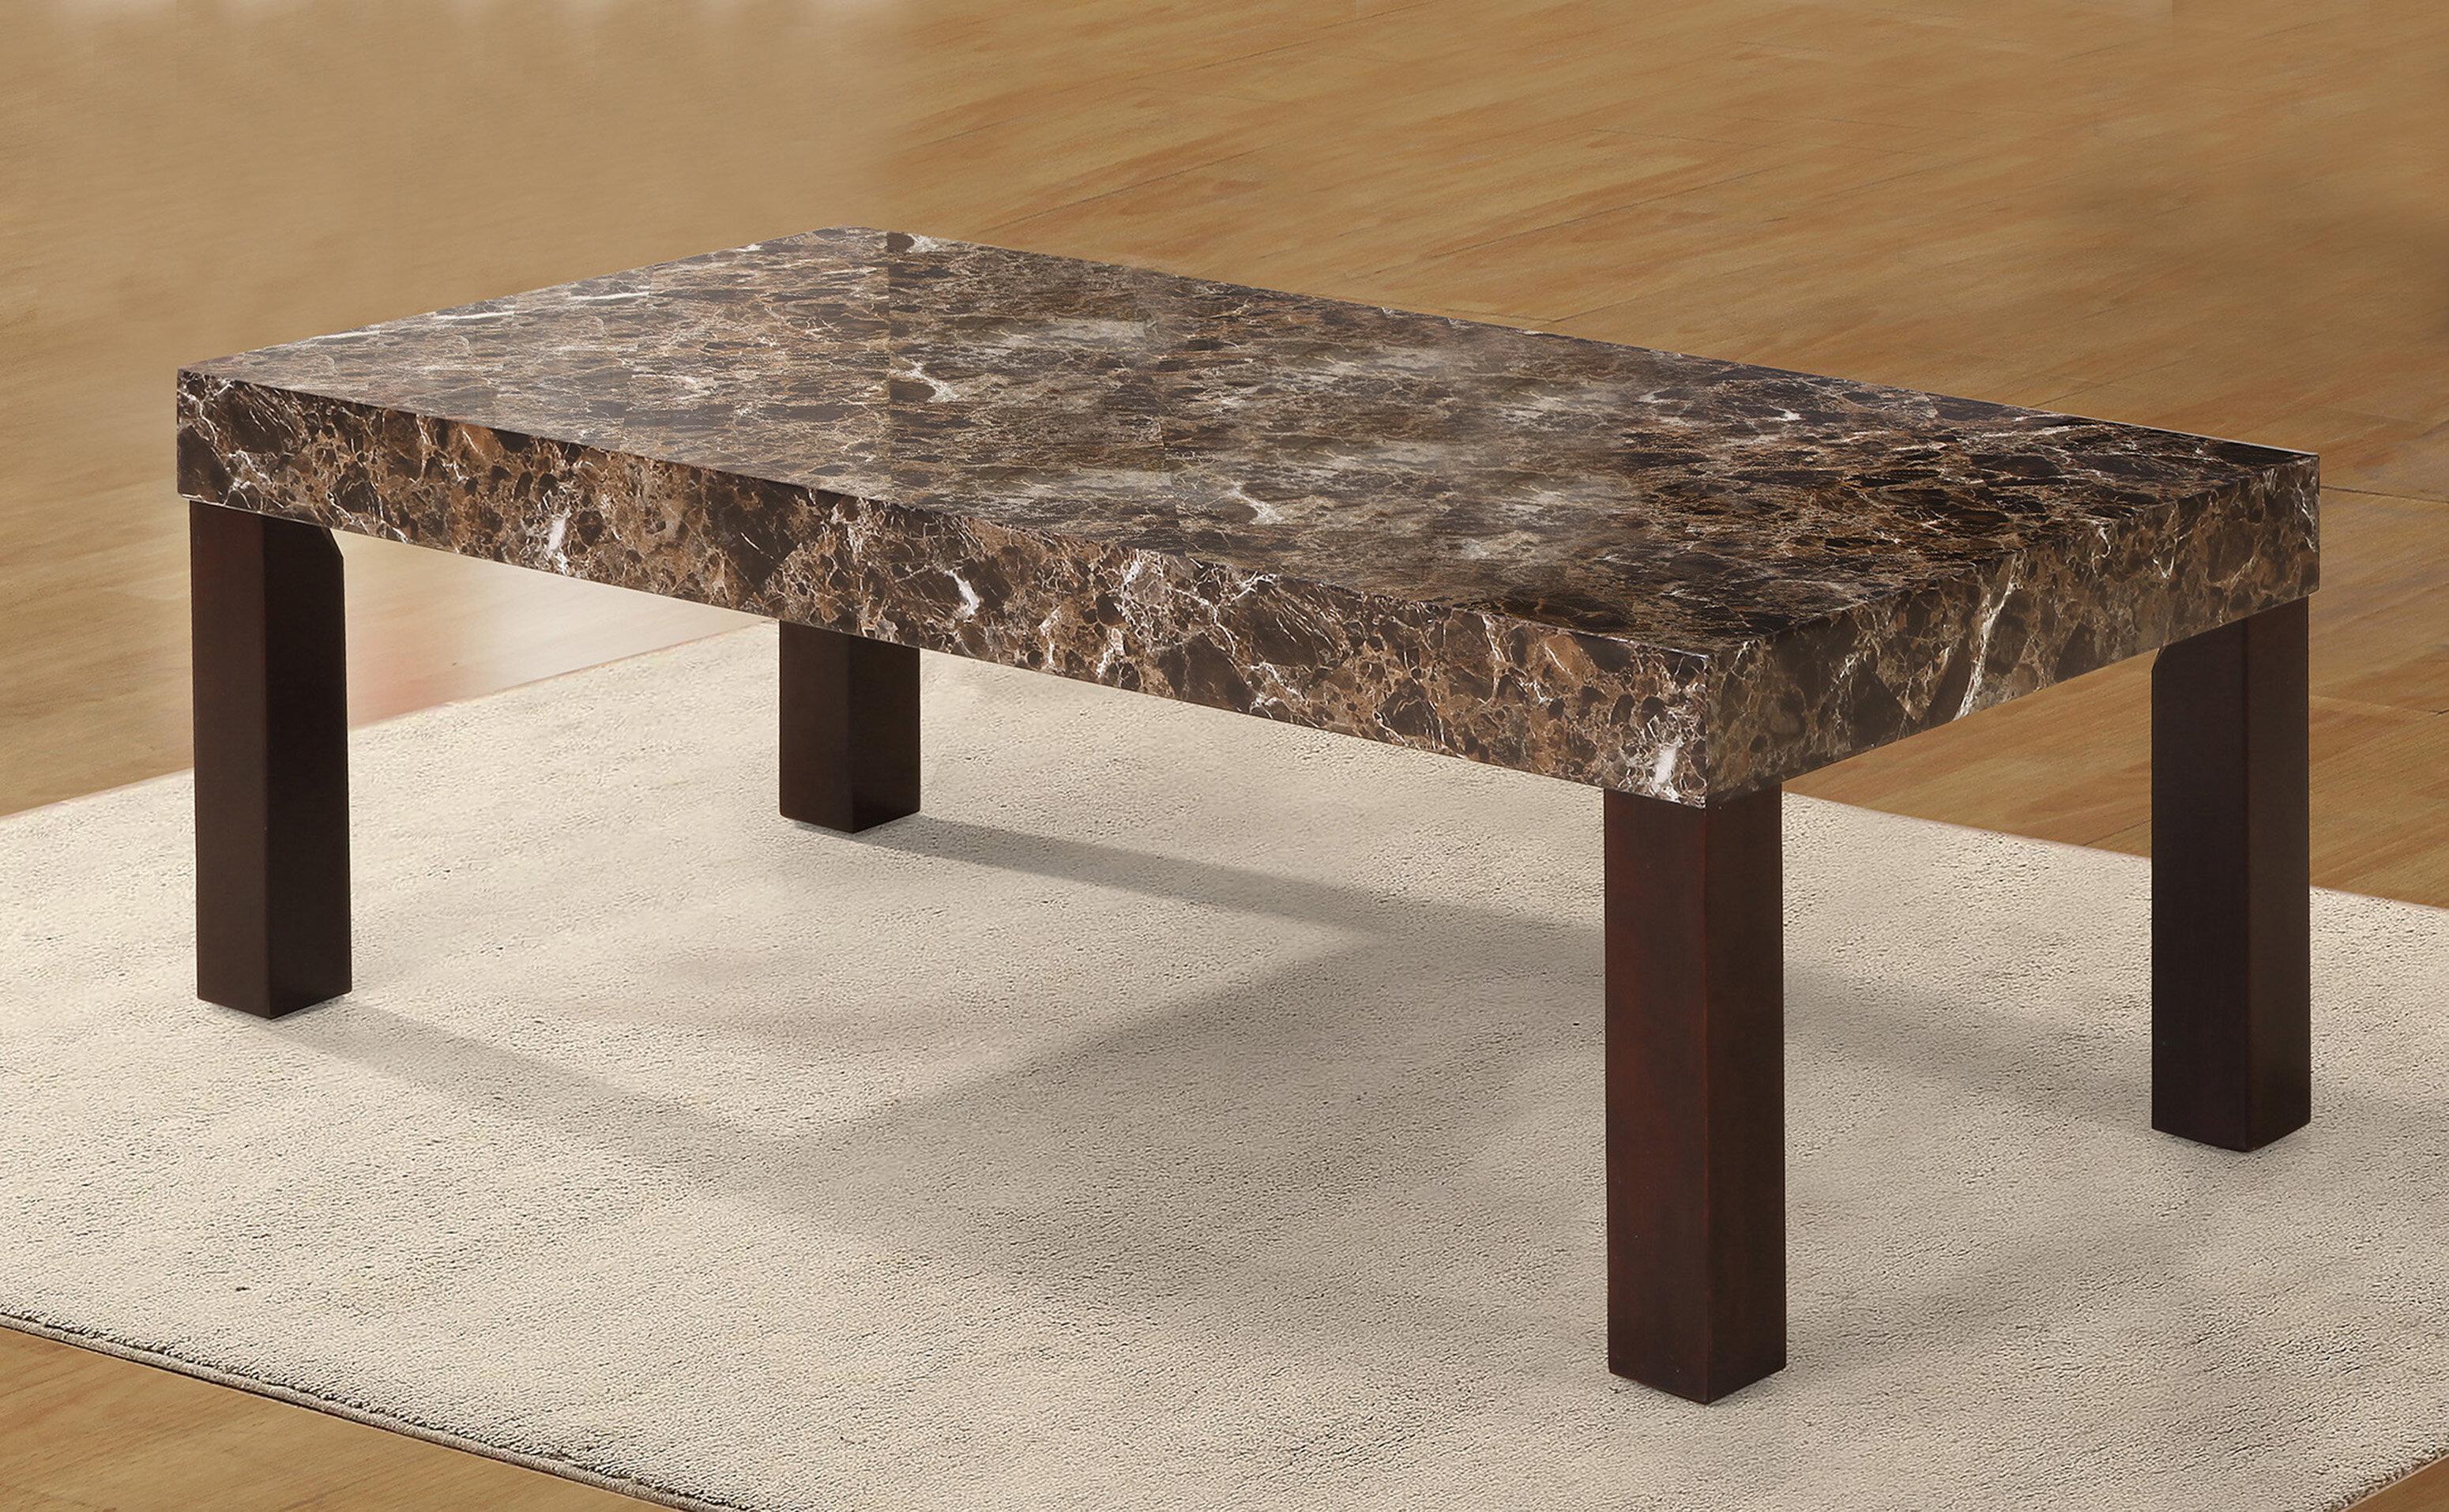 Red Barrel Studio Mccullum Faux Marbelized Granite Coffee Table Reviews Wayfair